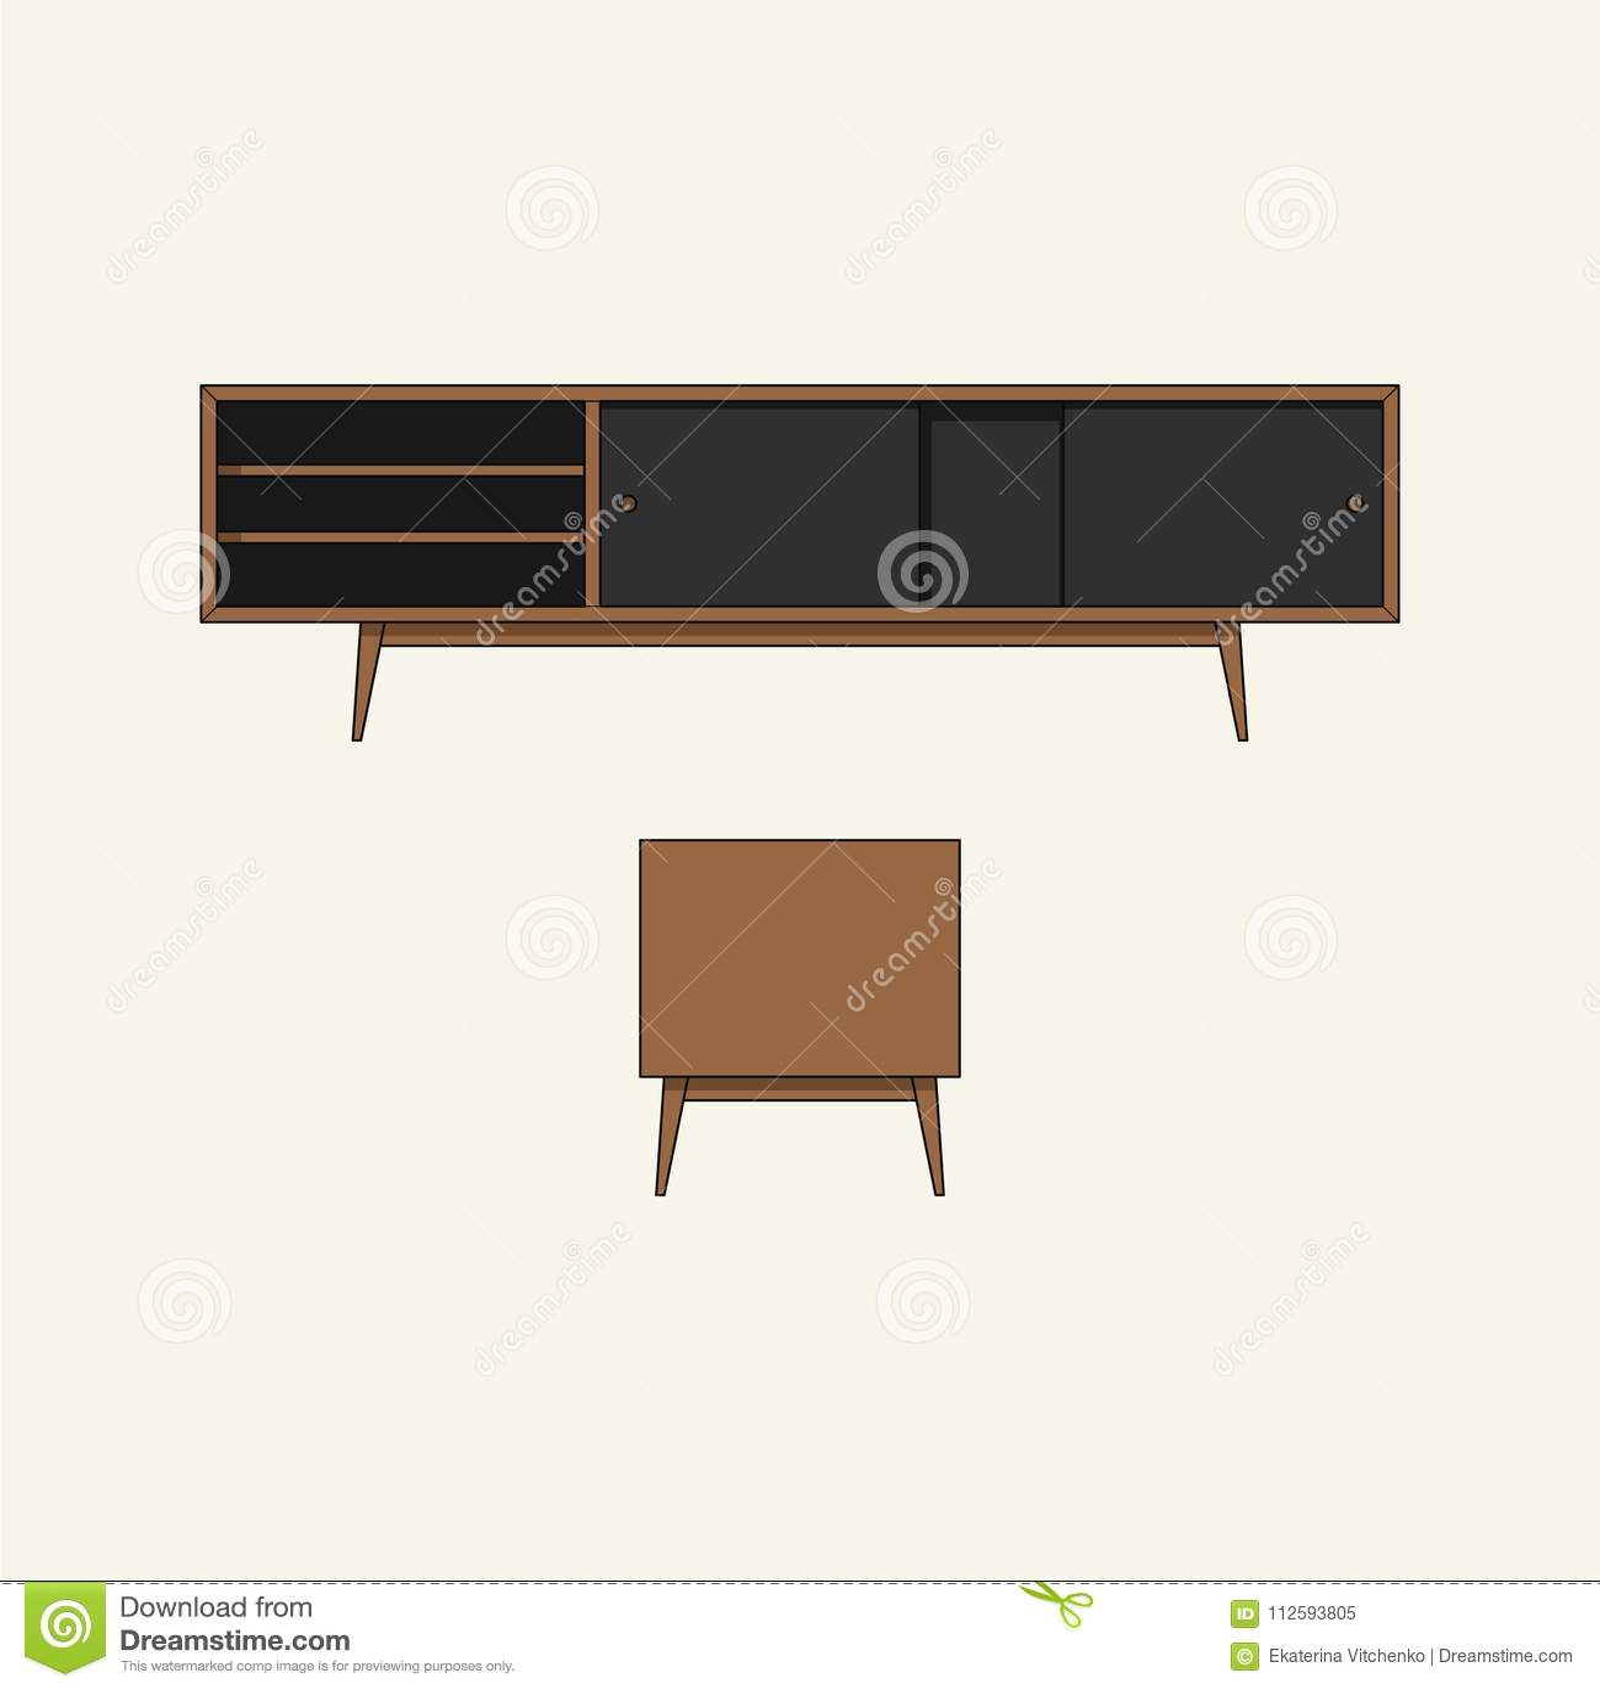 Download Wooden TV Table Stock Vector. Illustration Of Doors   112593805